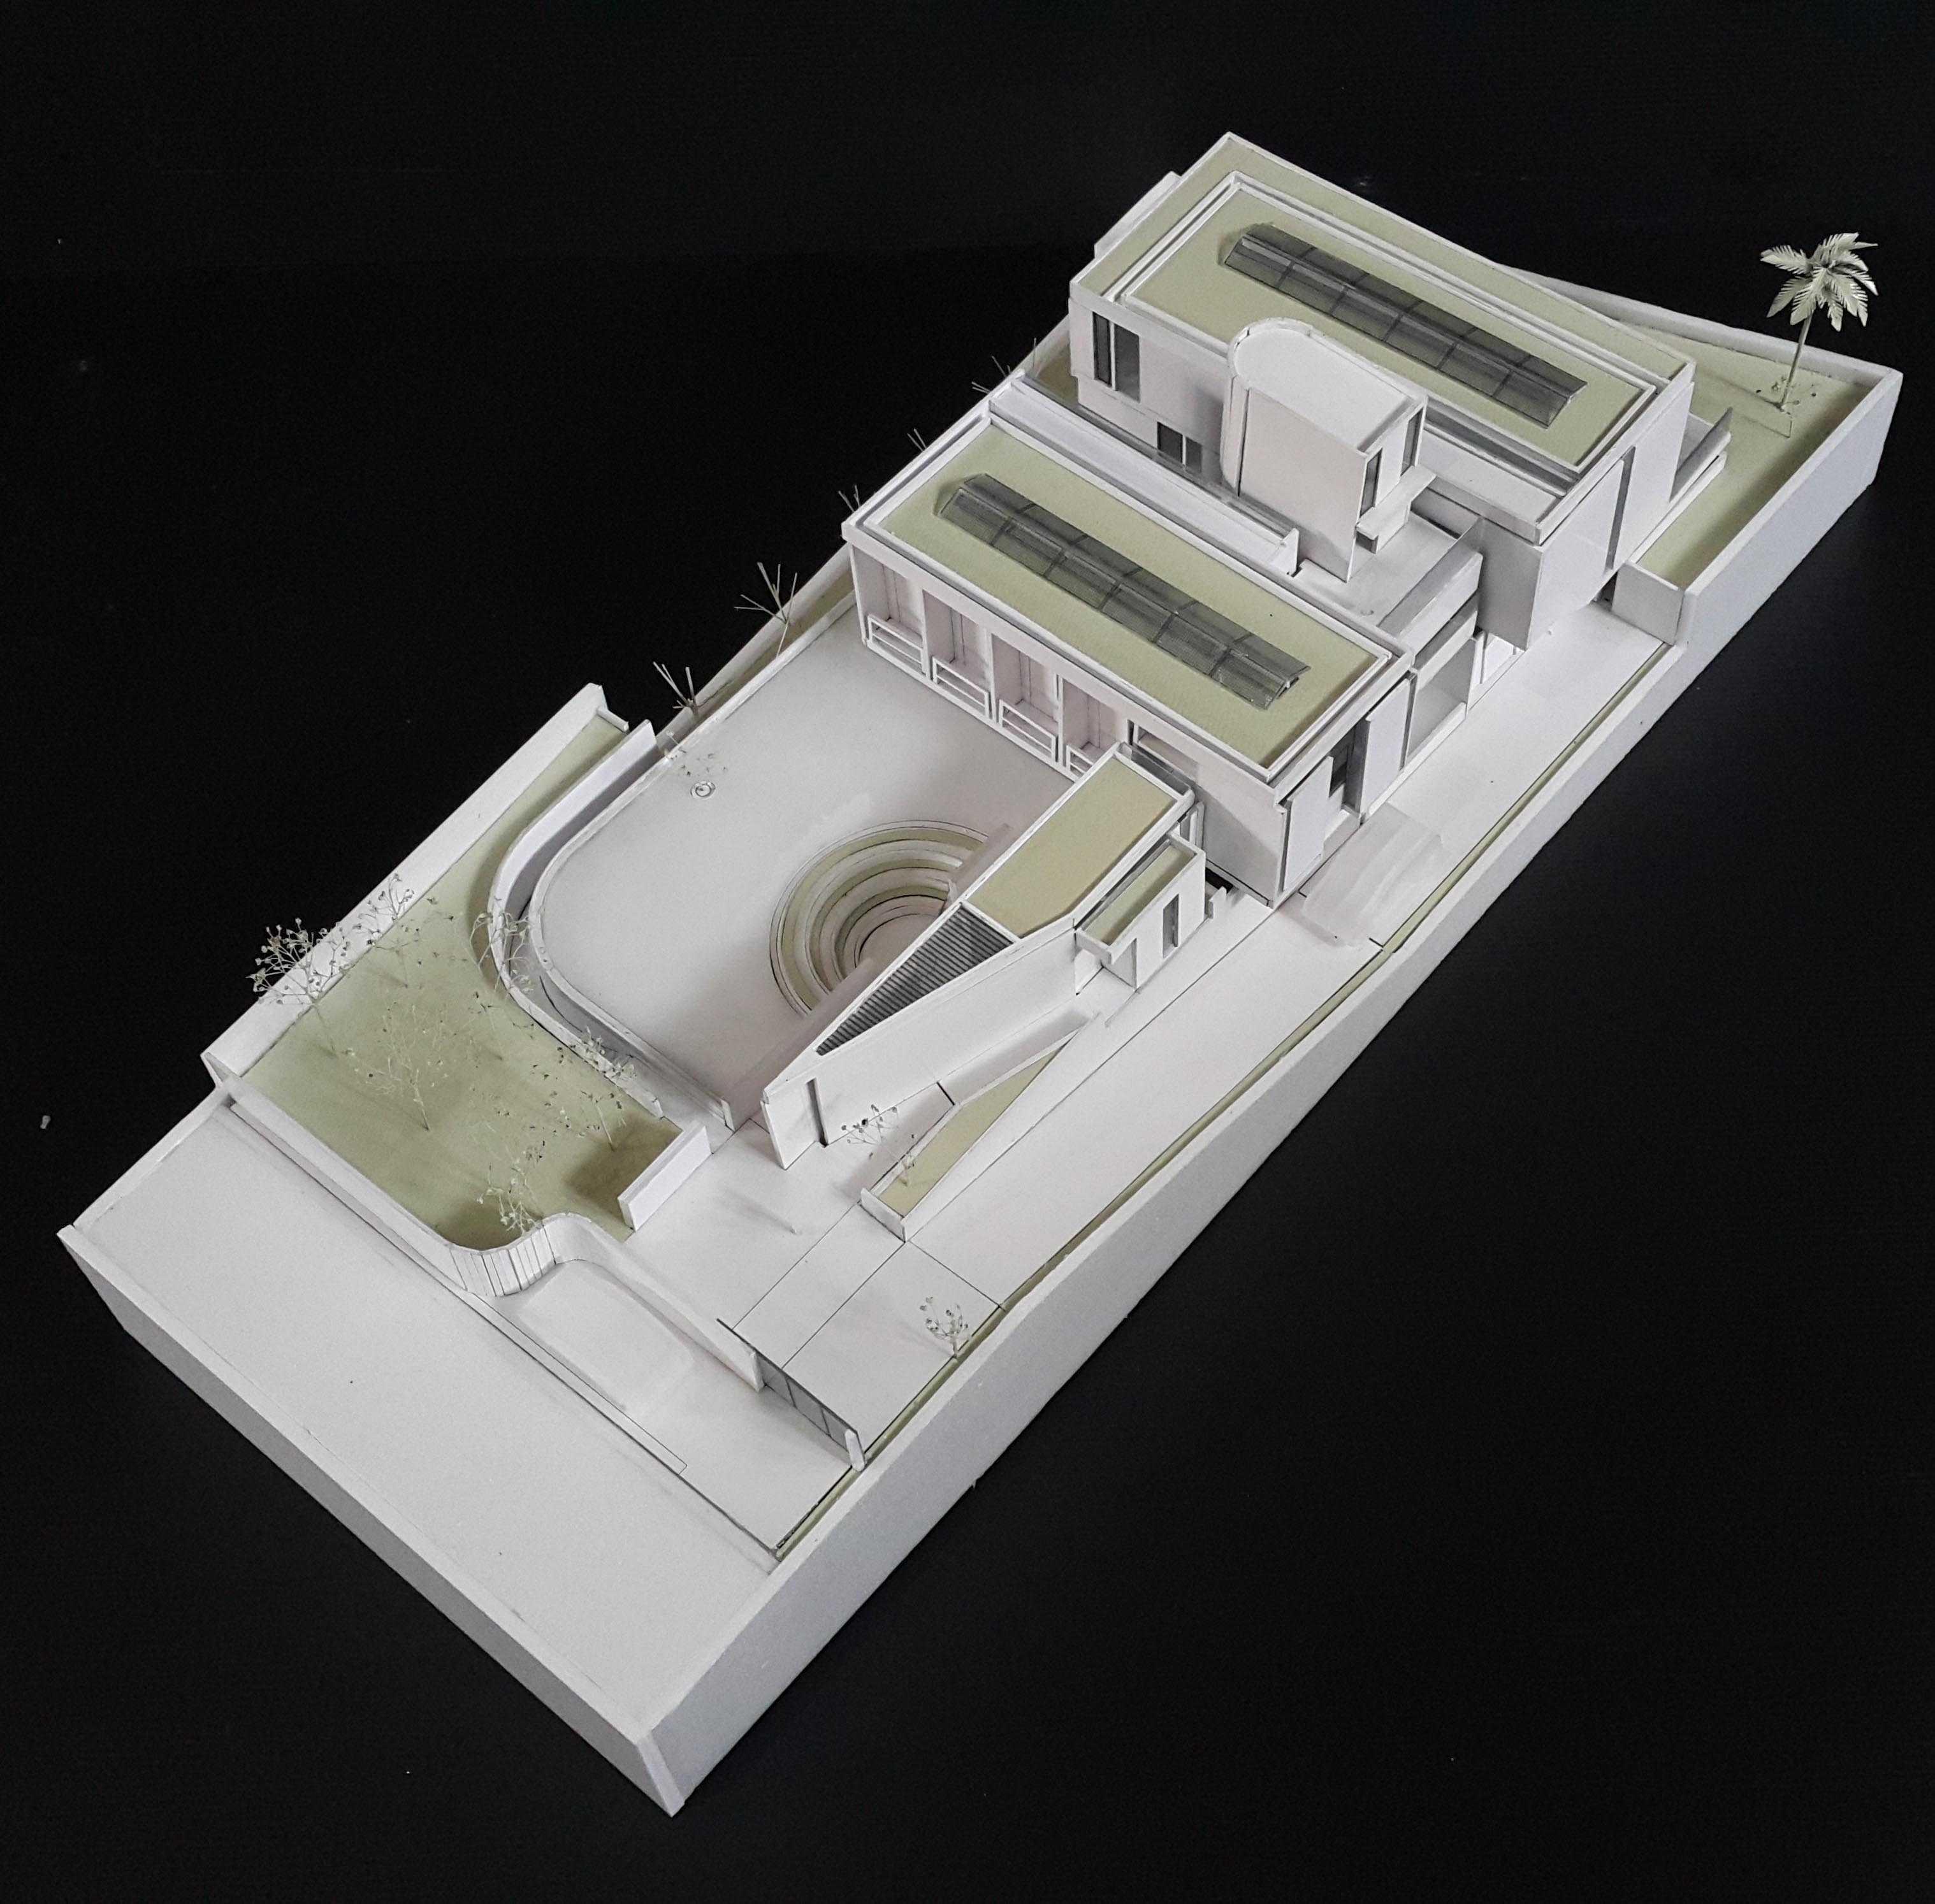 Akbar Hantar Yl House Adipala, Cilacap - Central Java Adipala, Cilacap - Central Java Study-Model   24742